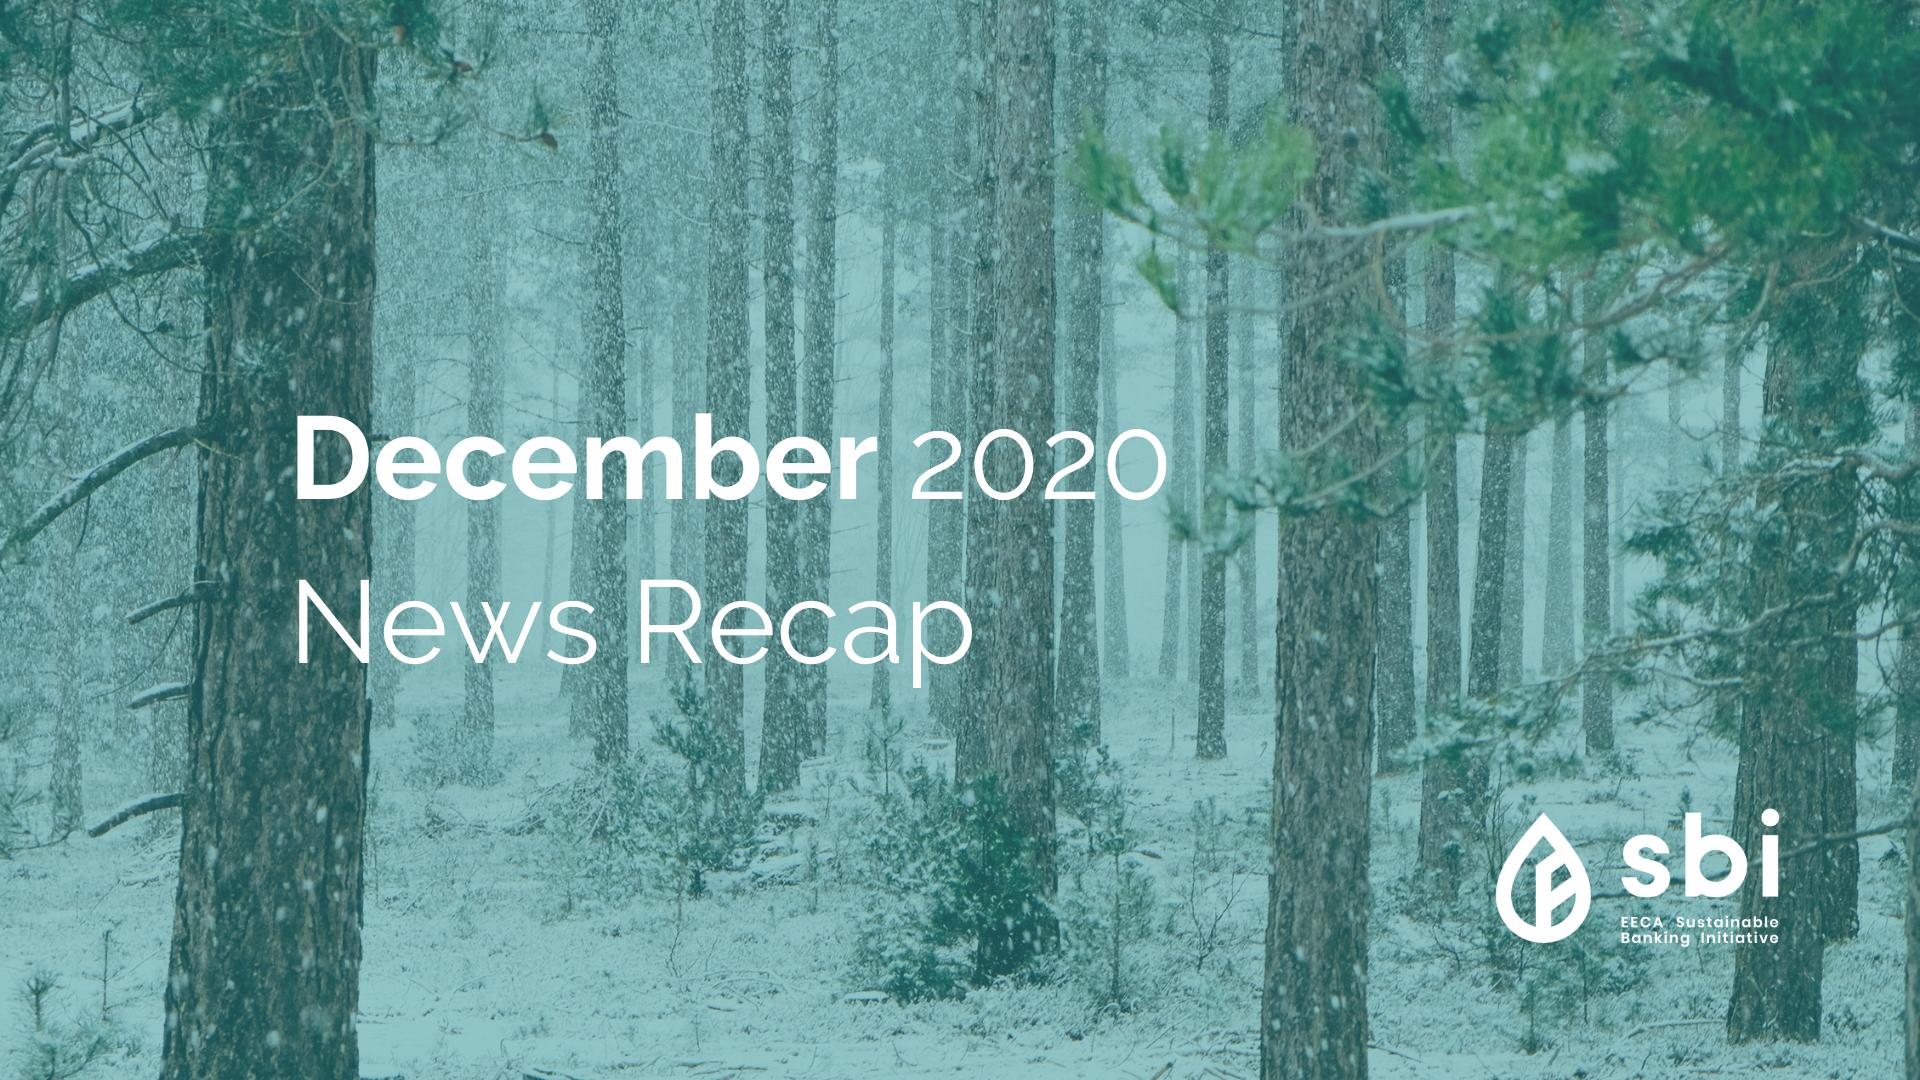 December 2020 News Recap